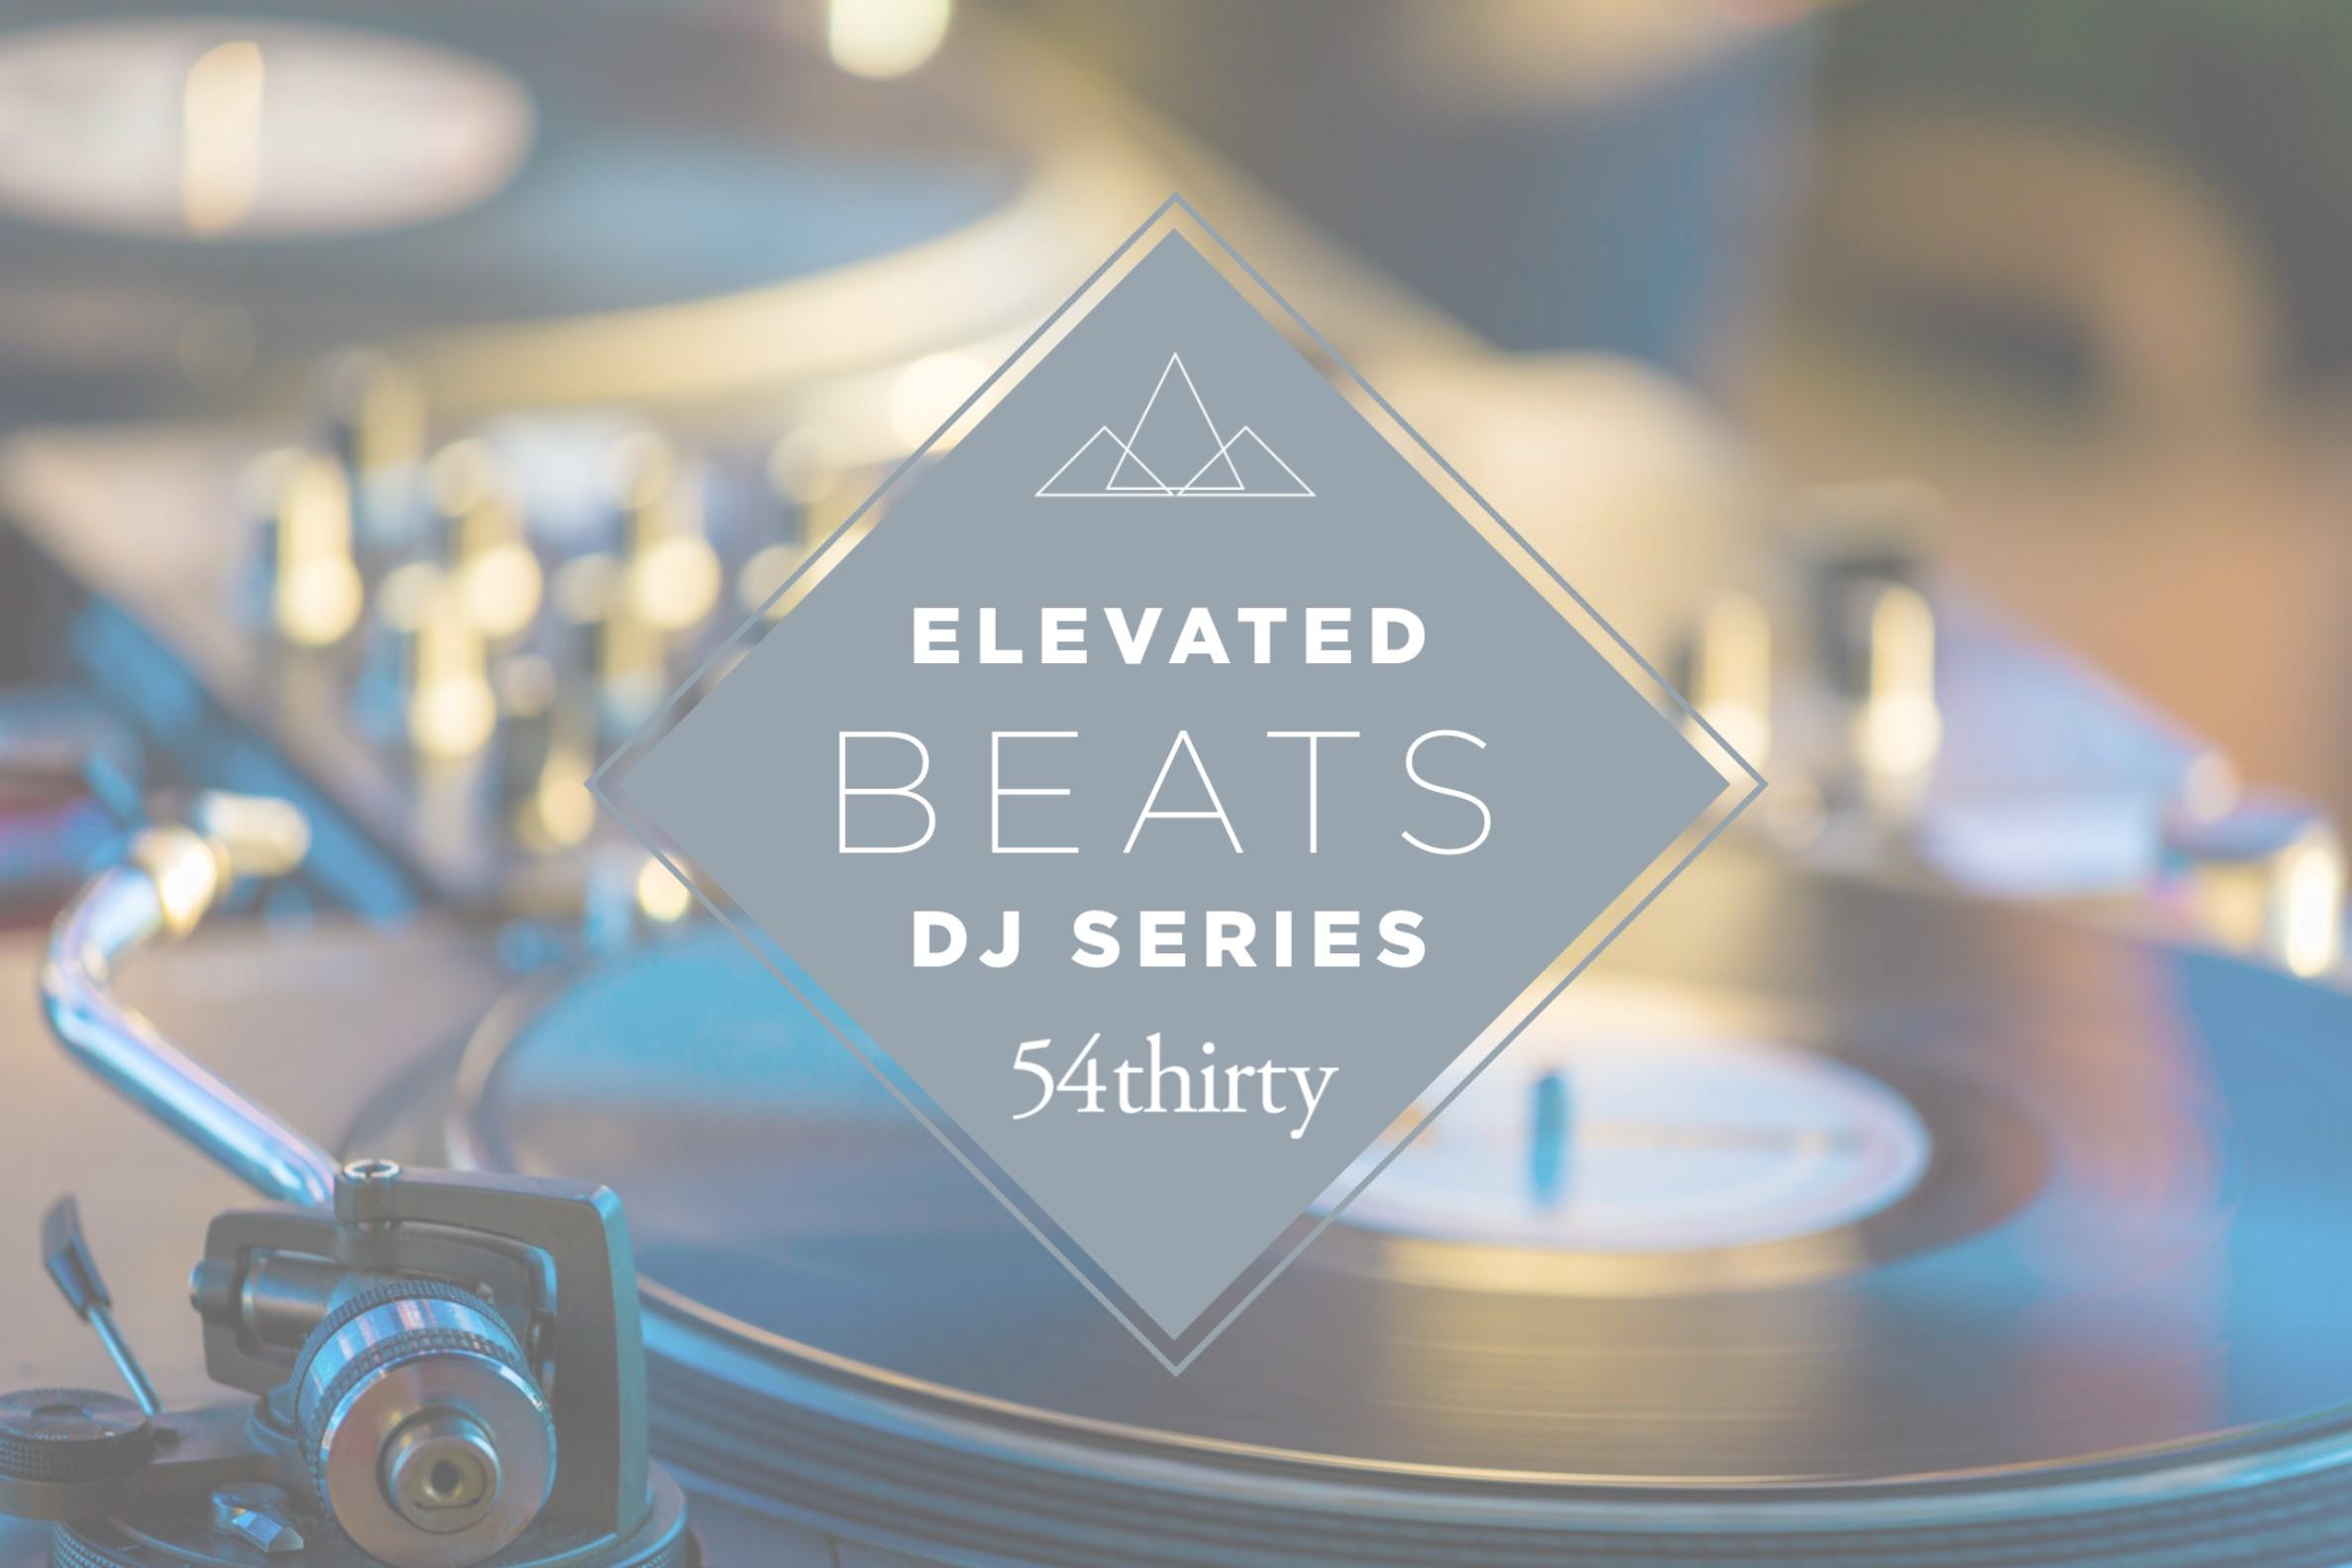 Elevated Beats Photo.jpg